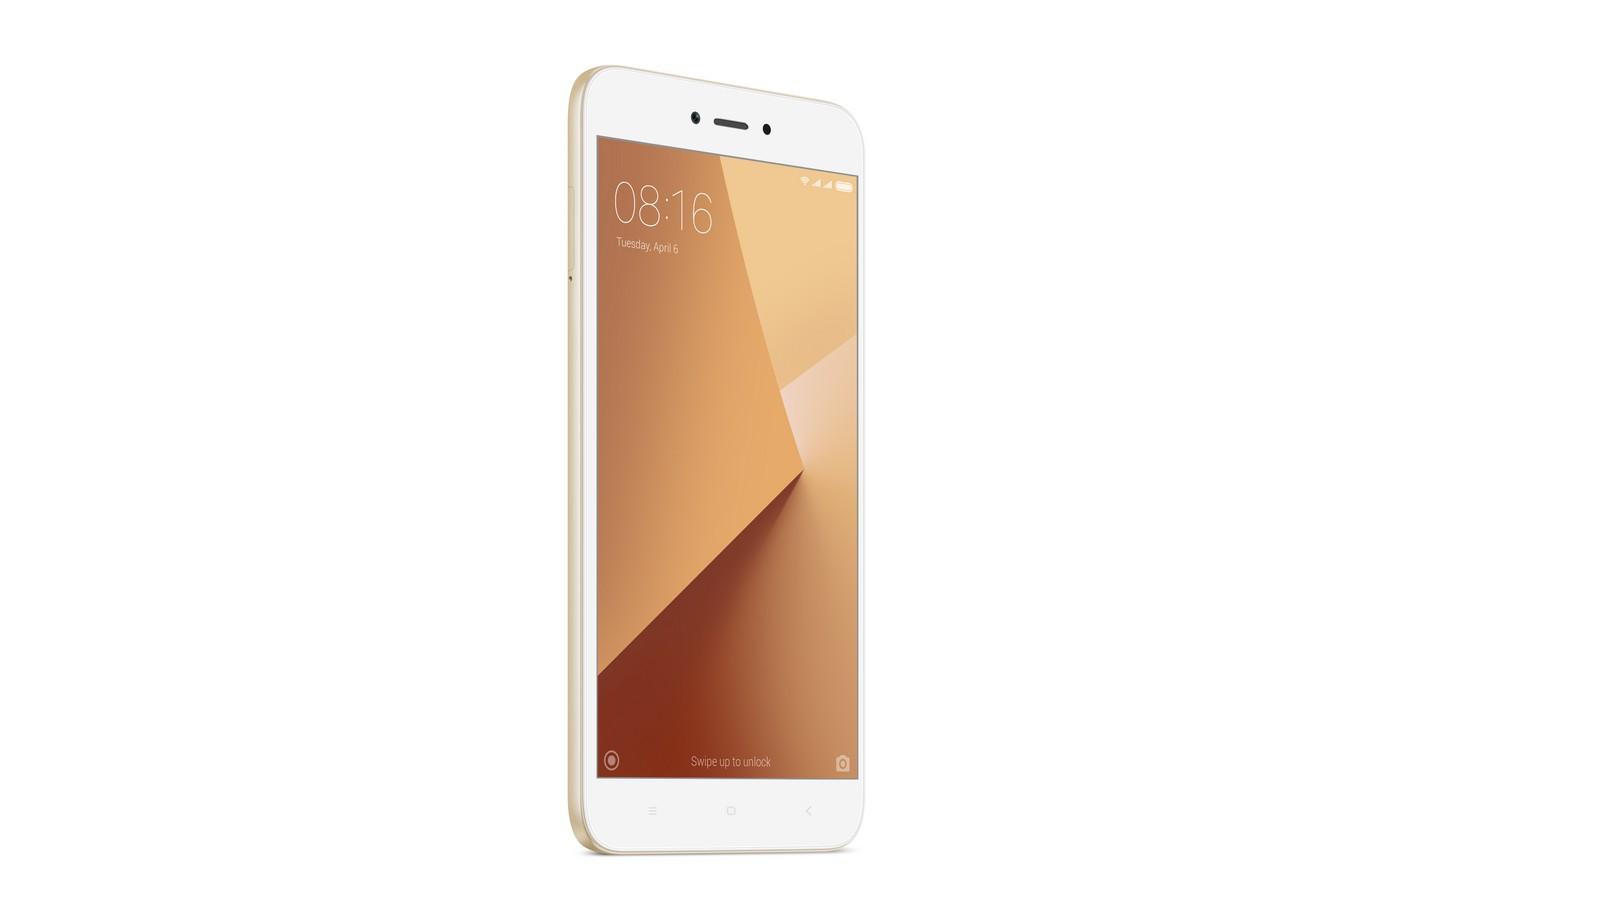 Xiaomi Redmi Note 5A lên kệ giá 3,3 triệu đồngXiaomi Redmi Note 5A lên kệ giá 3,3 triệu đồng